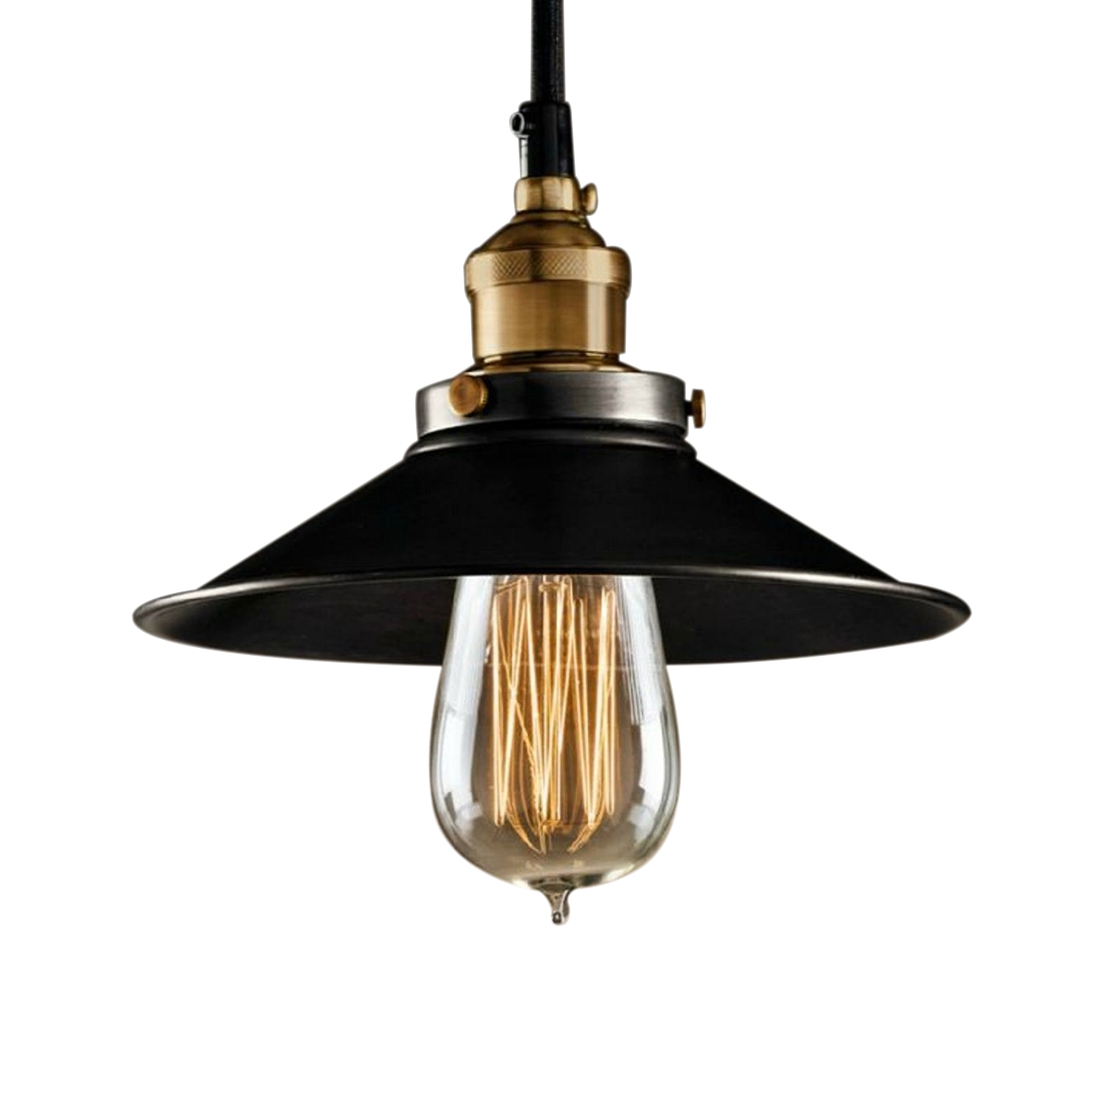 Vintage Pendant Lights Loft Pendant Lamp Retro Hanging Lamp Lampshade For Restaurant /Bar/Coffee Shop Home Lighting HITL